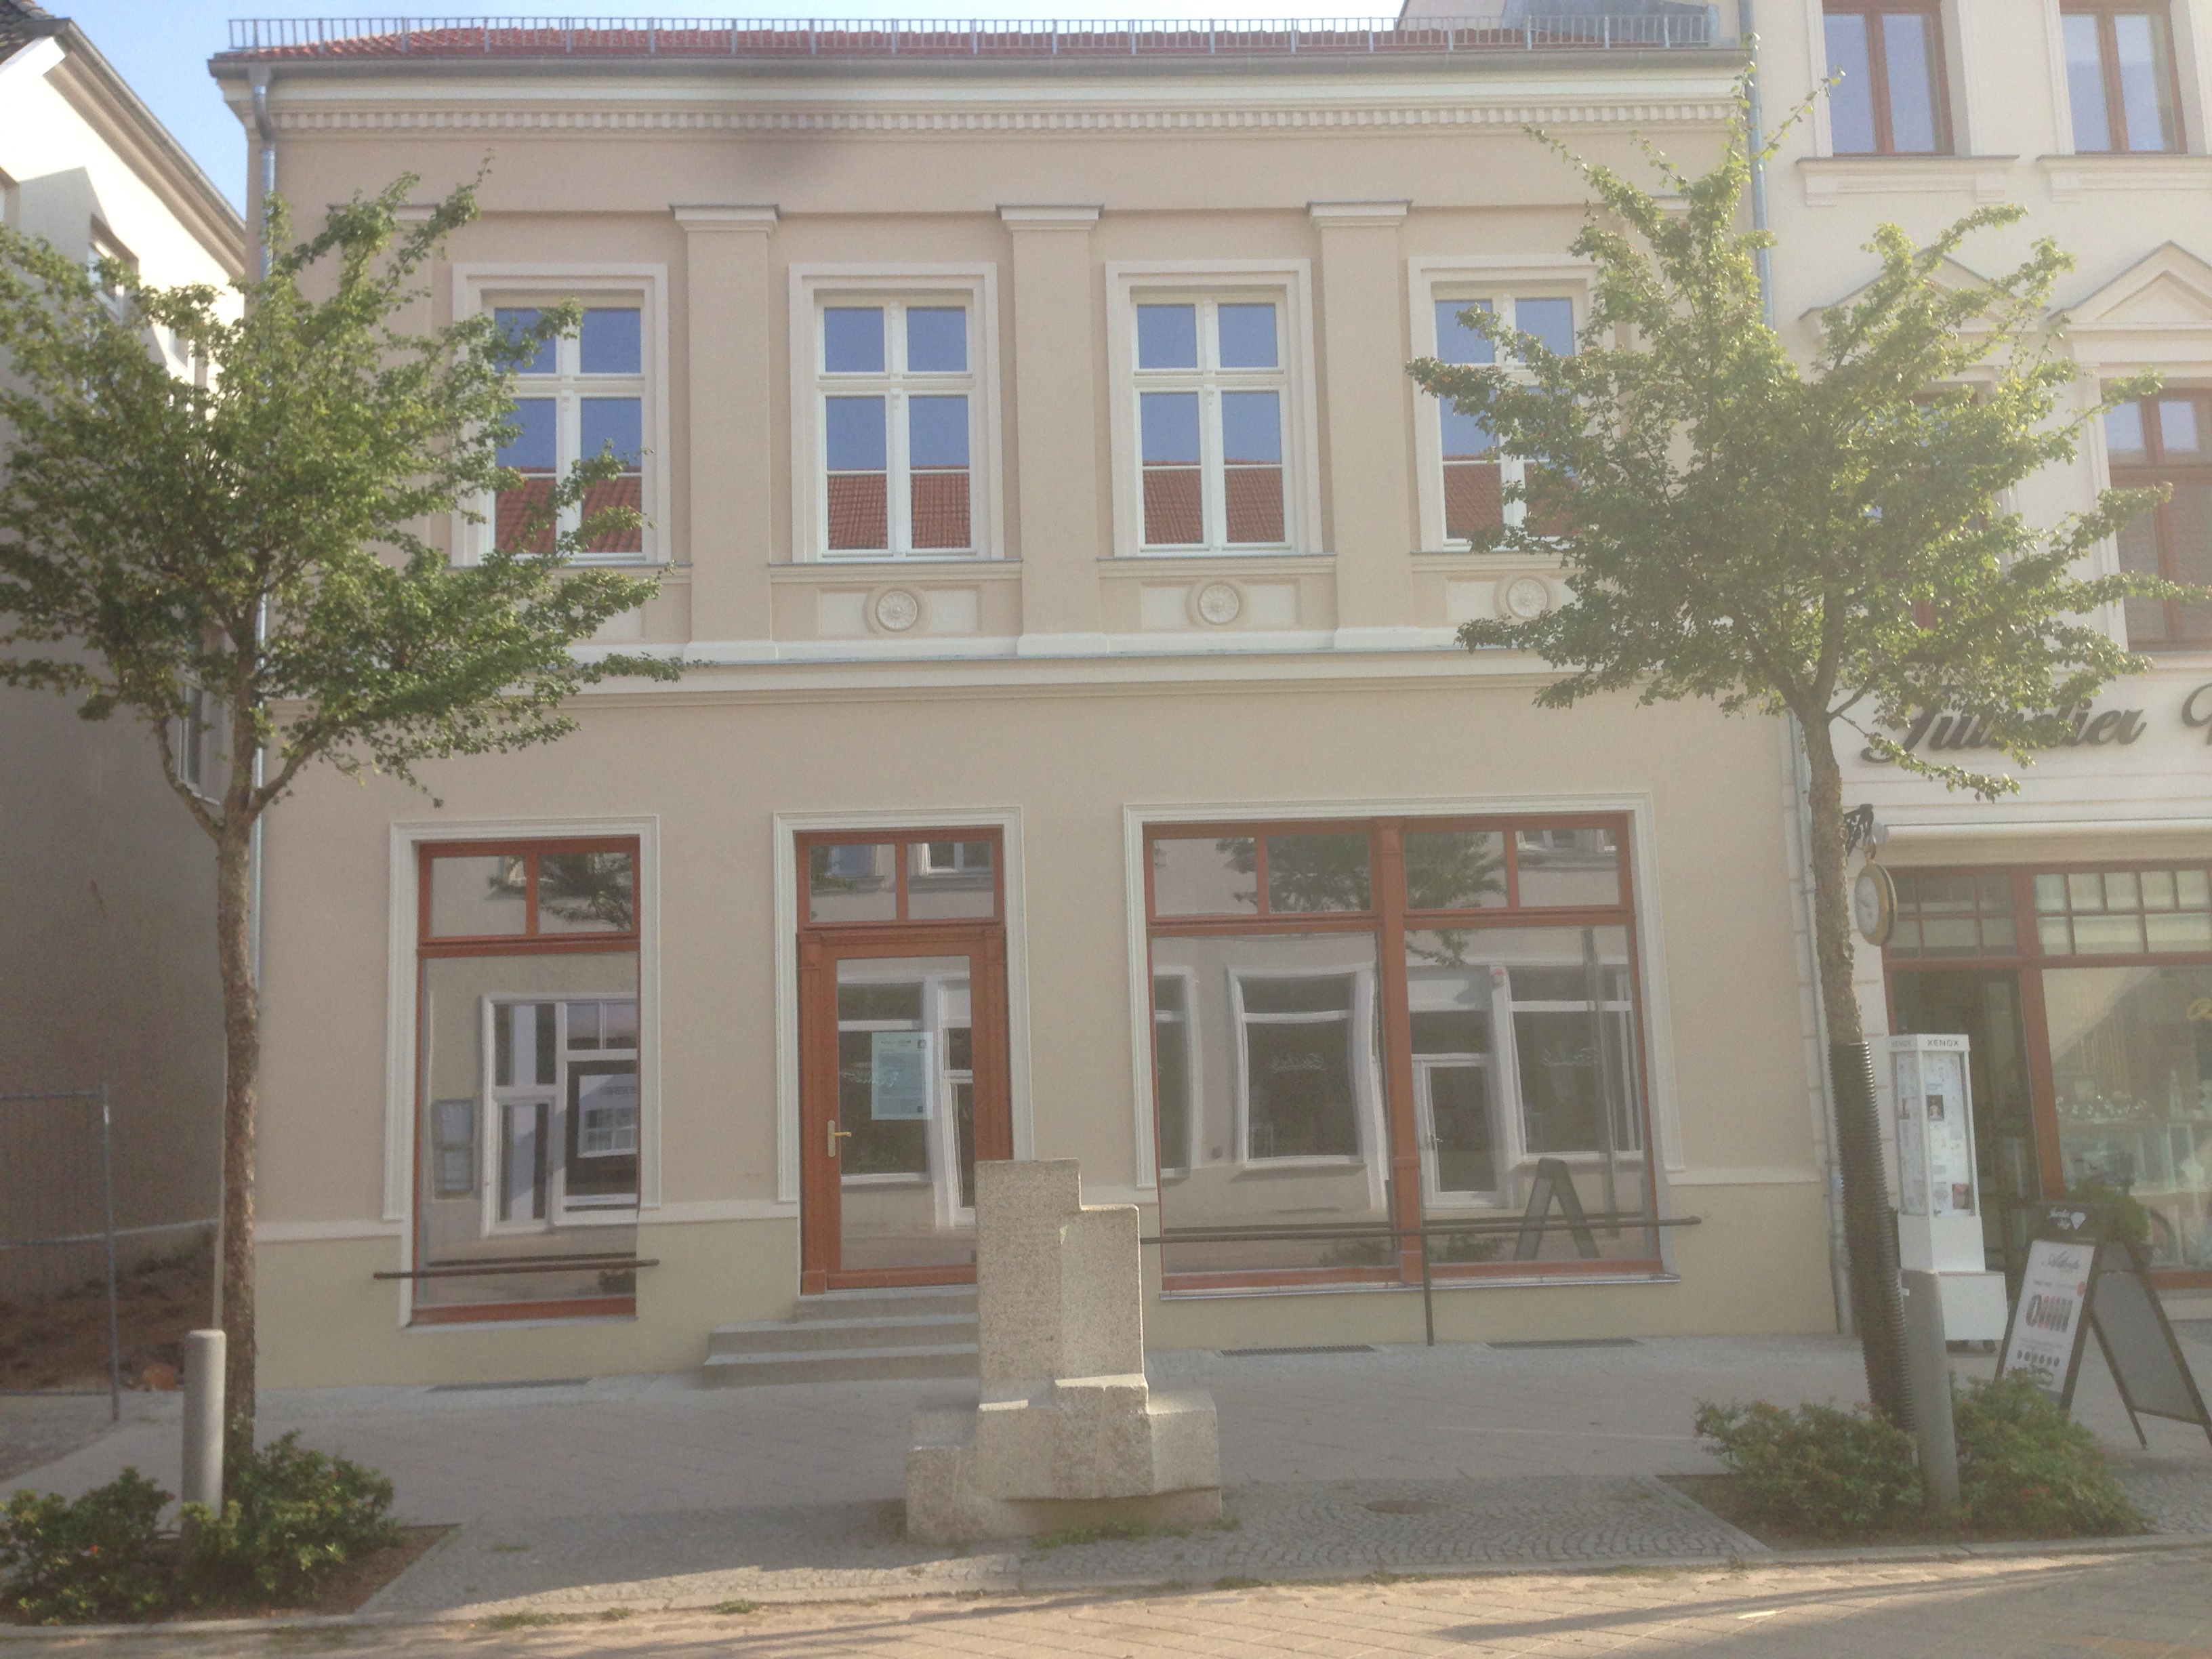 Strelitzer Straße 11